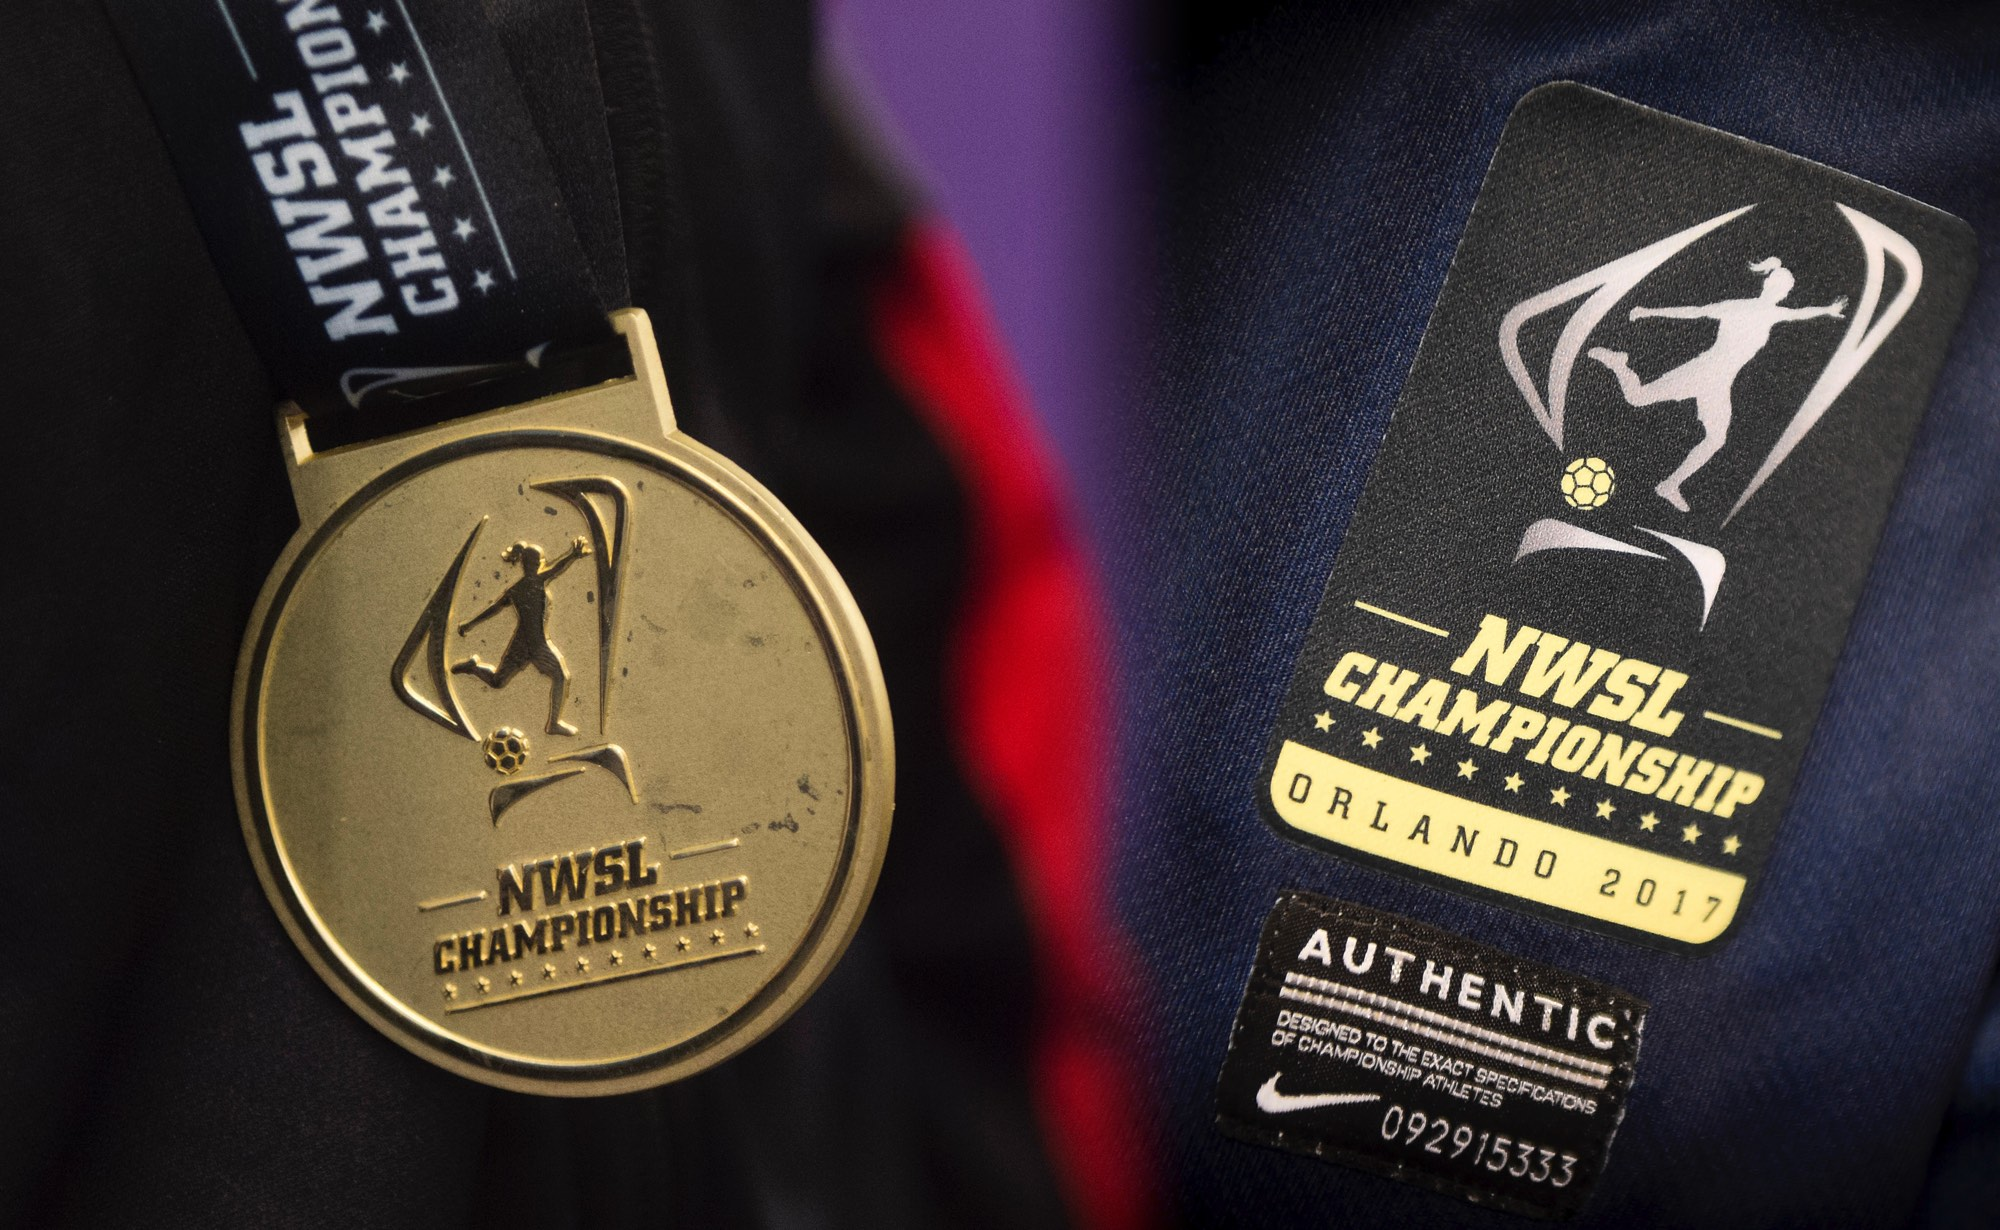 nwsl-championship-environmental-2